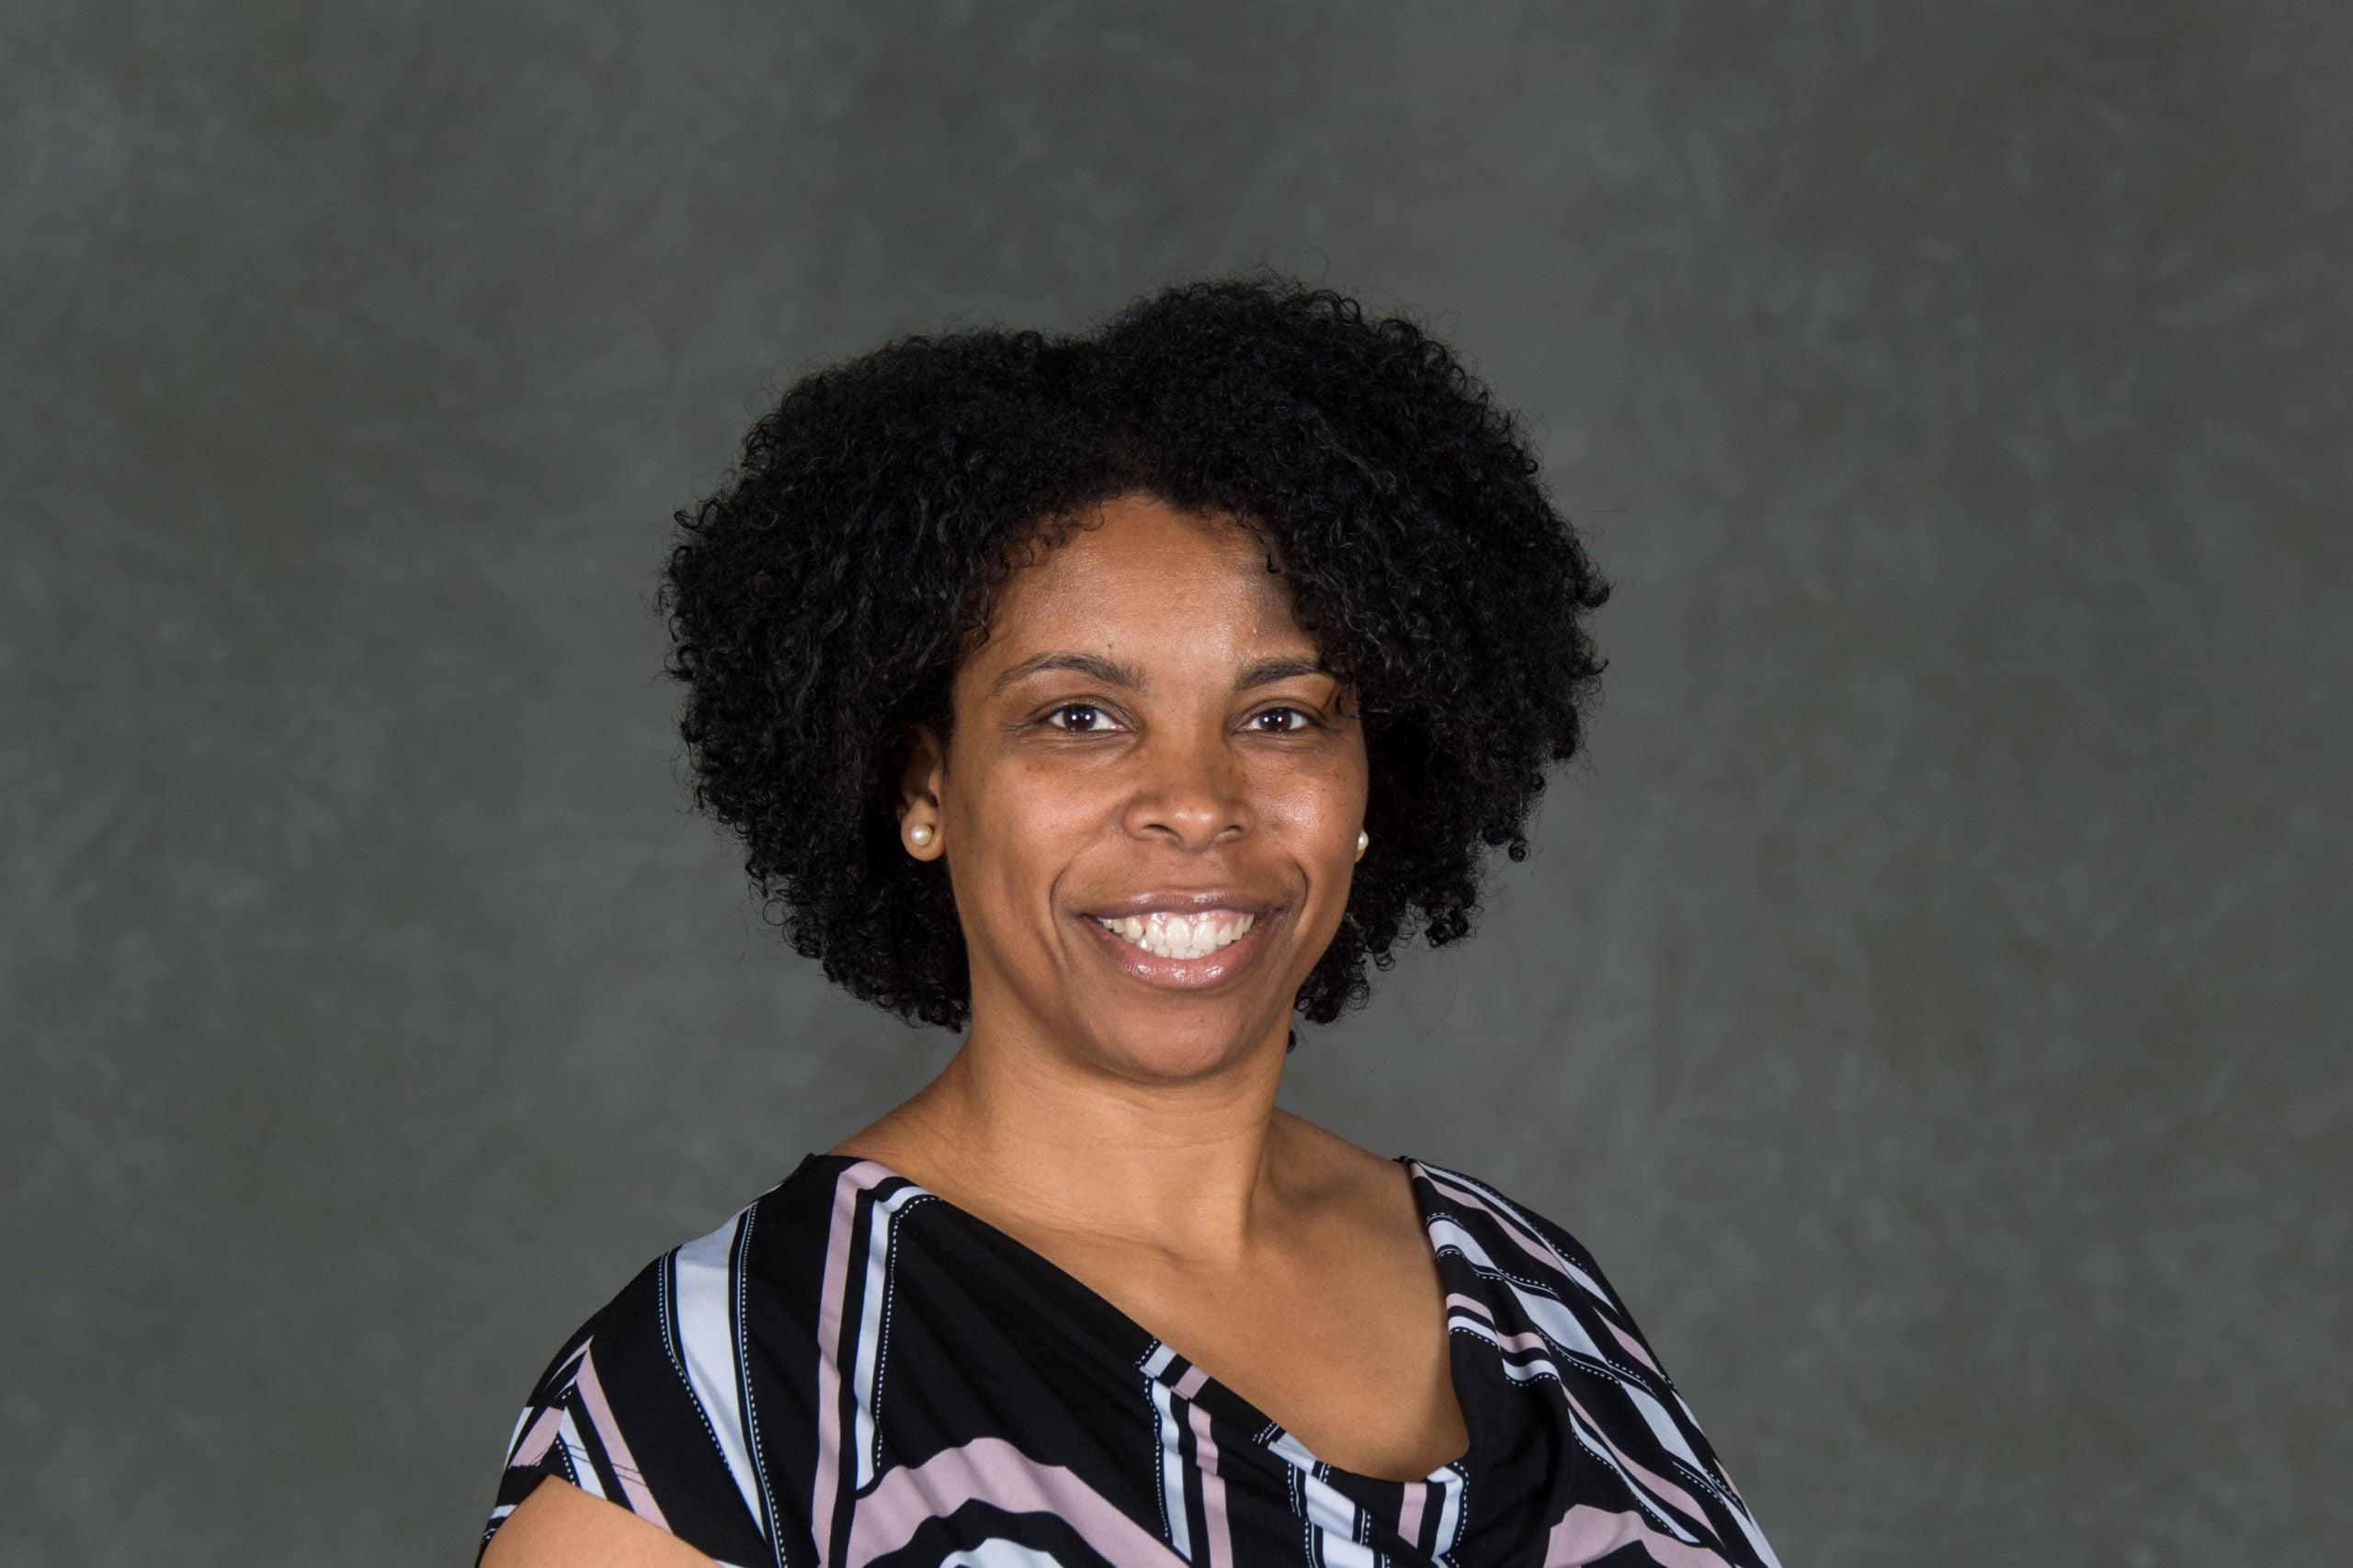 Professor Kimberly Sellers